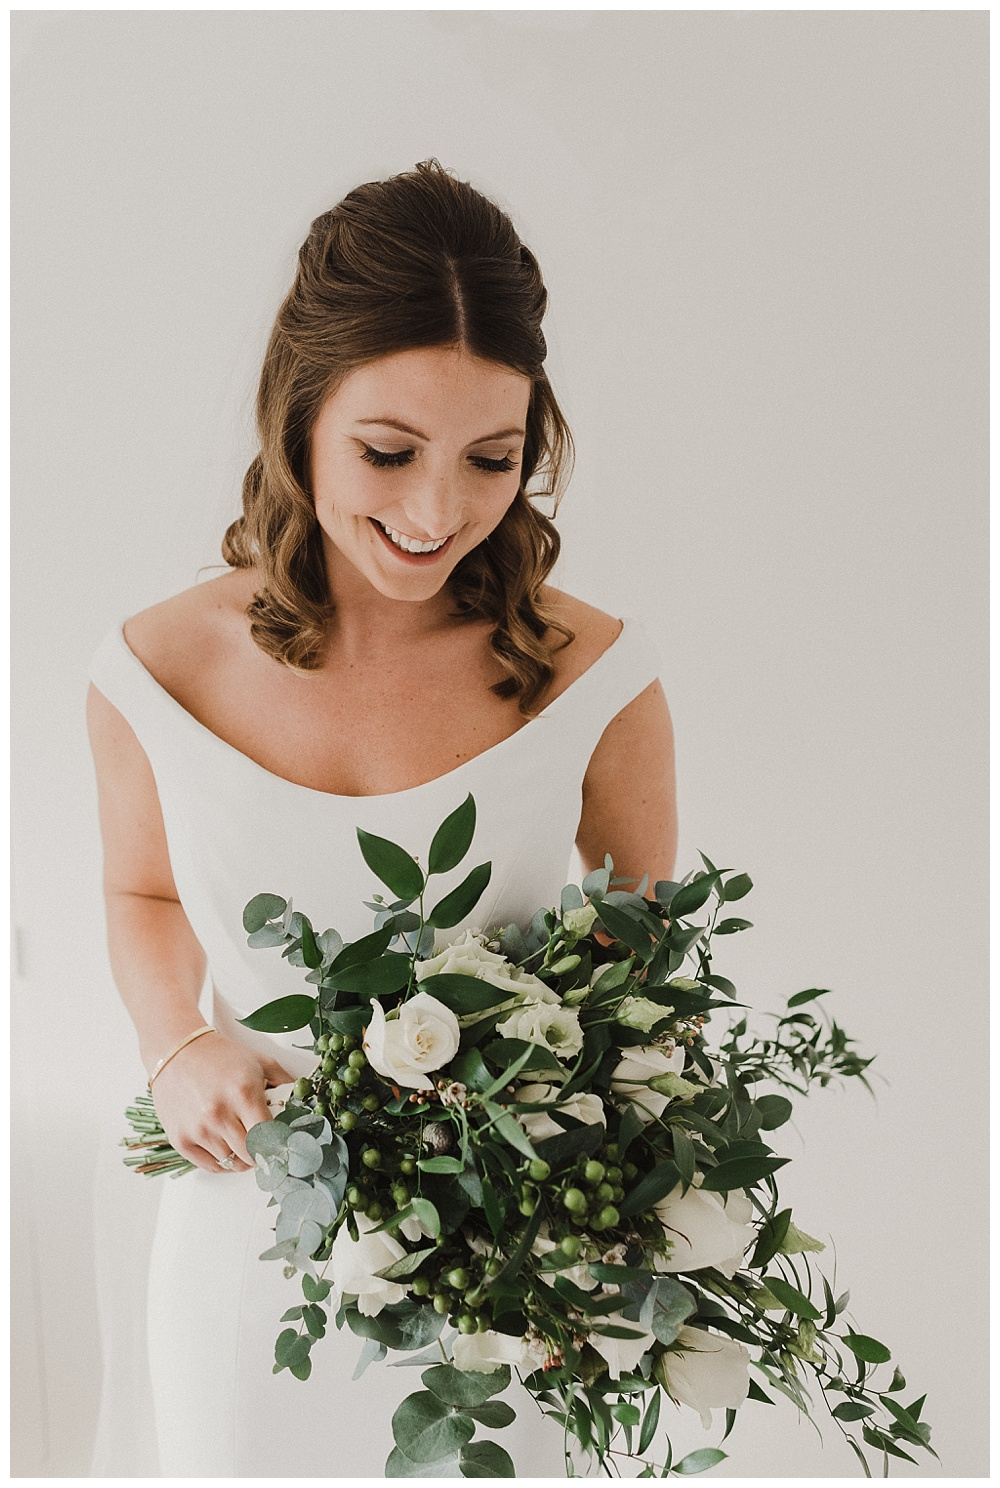 Bride in wedding dress with bouquet.